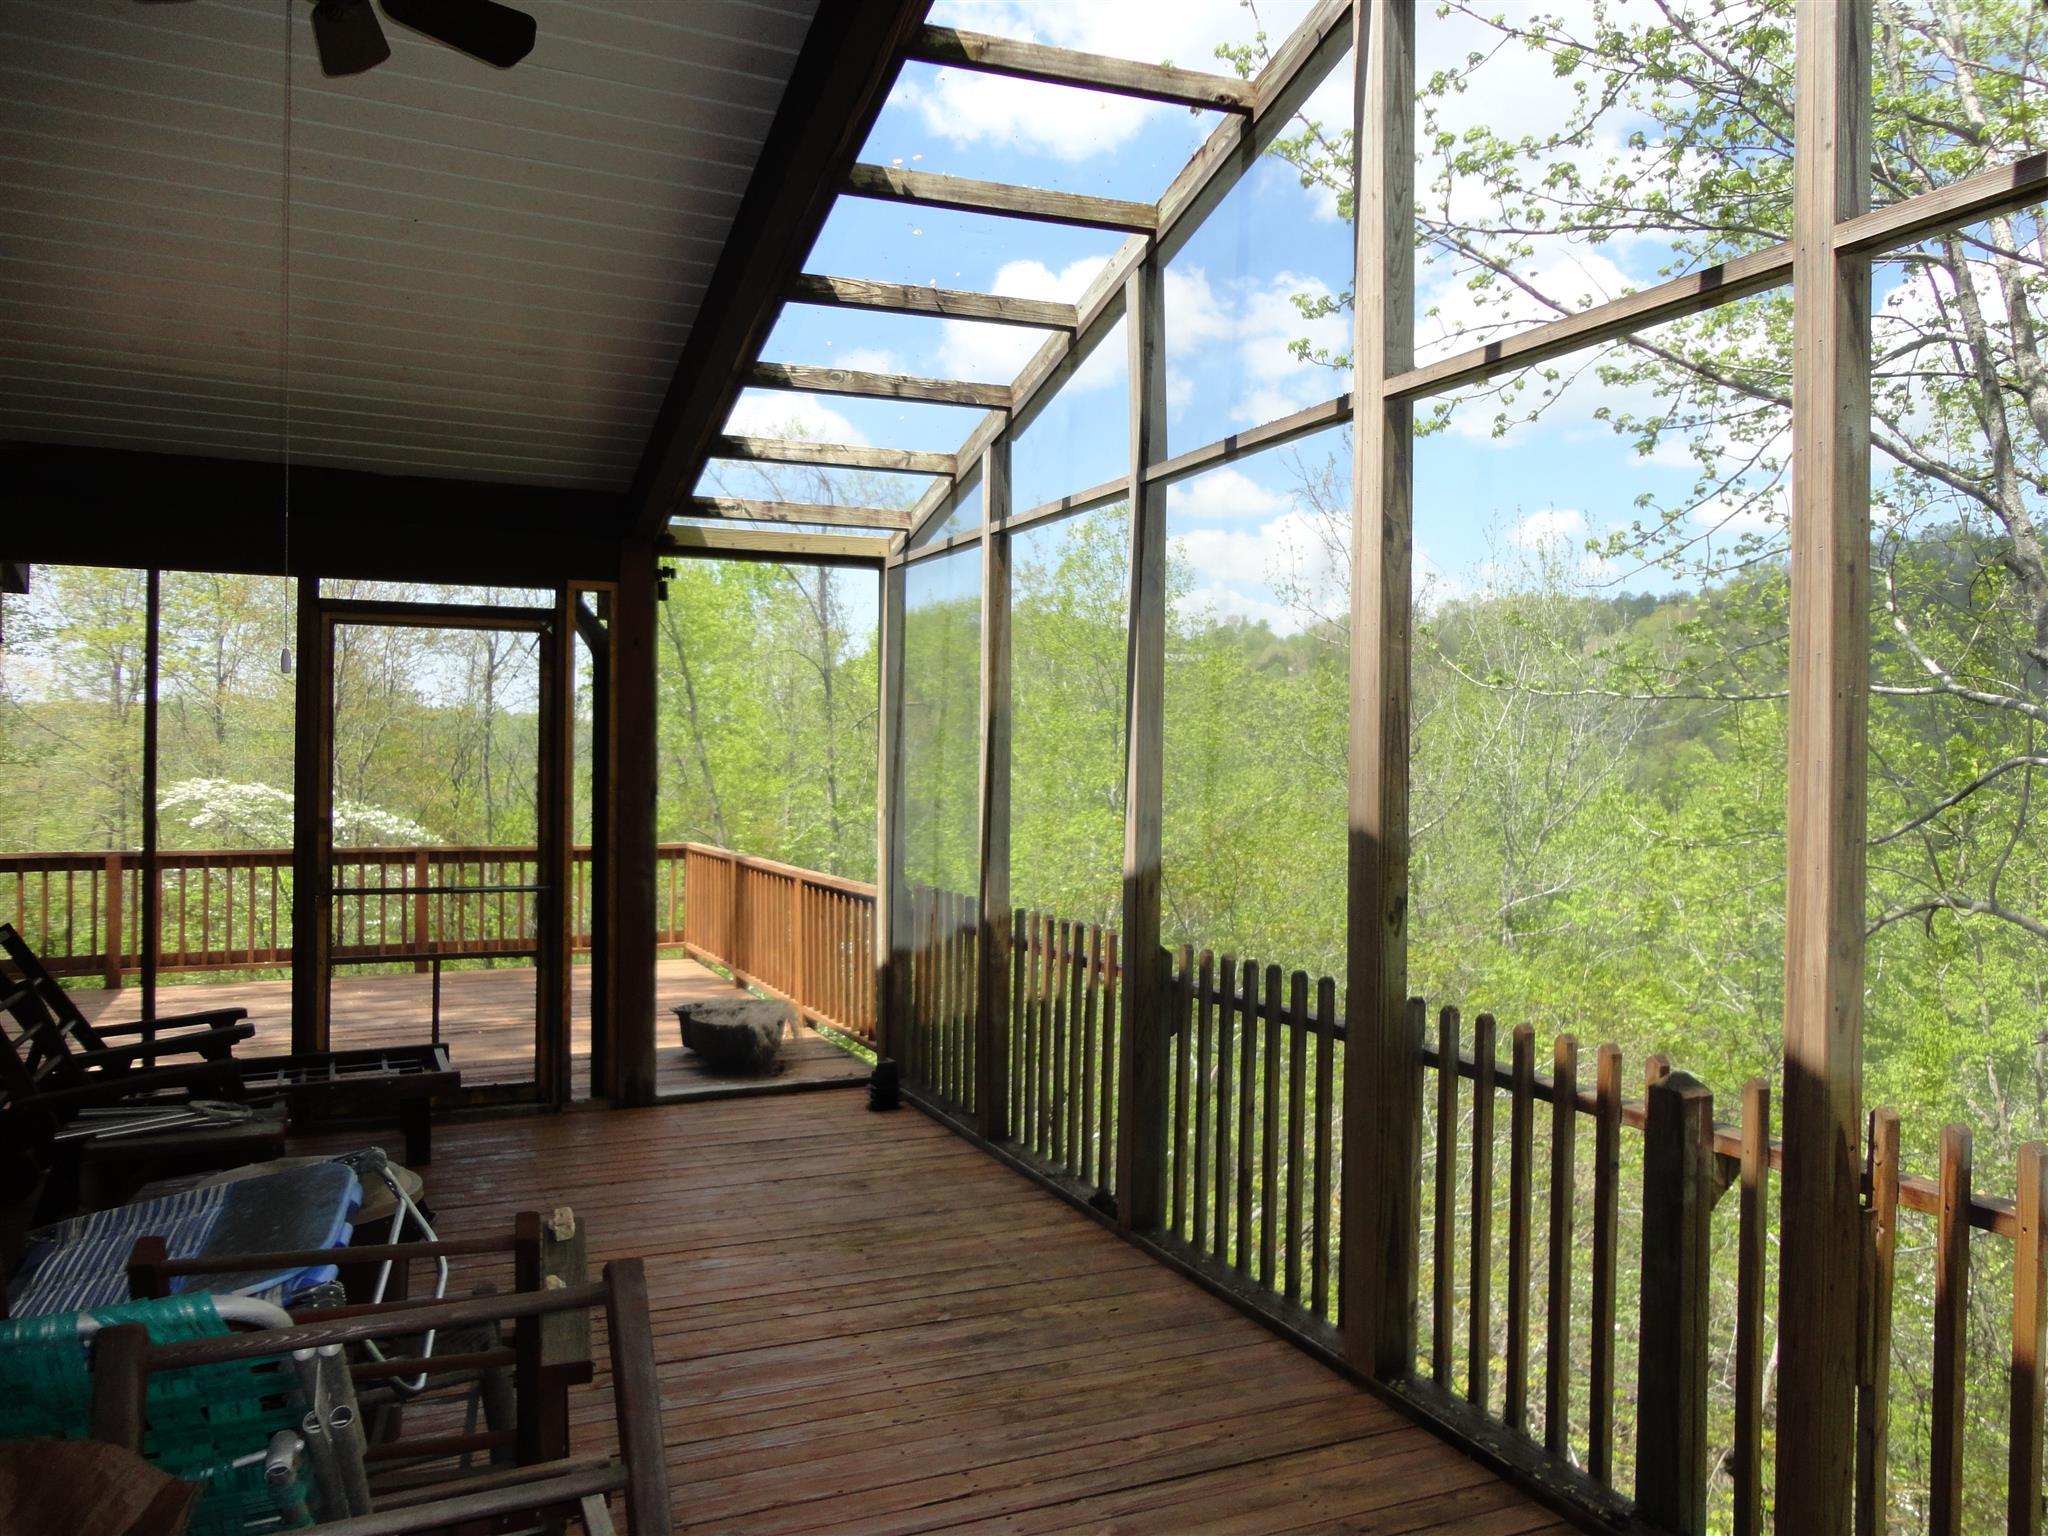 264 Summer Ct, Smithville, TN 37166 - Smithville, TN real estate listing